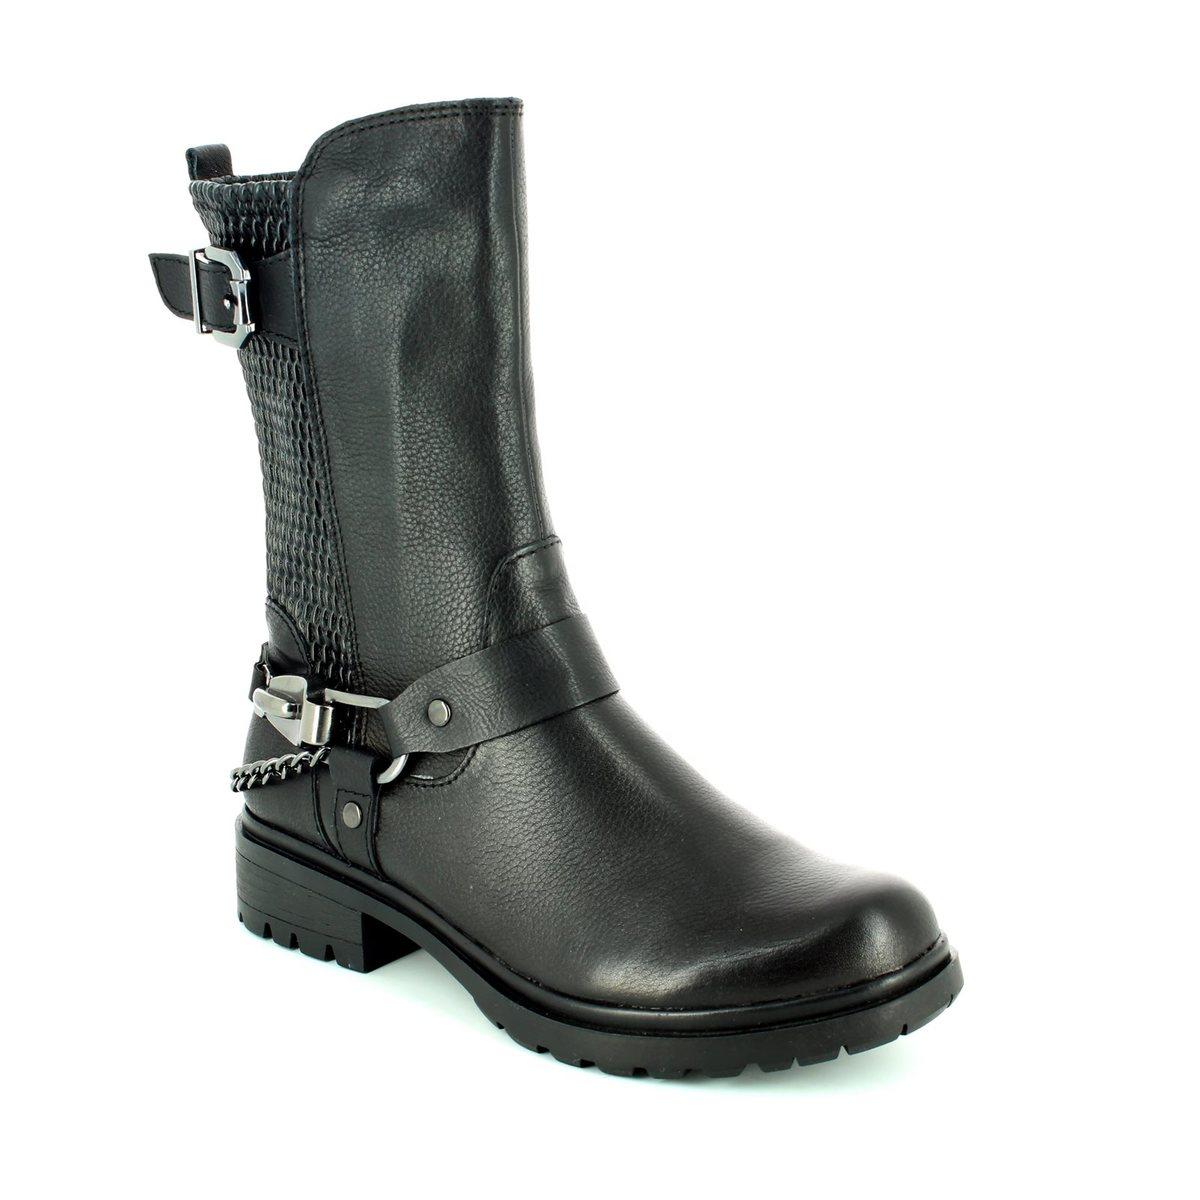 tamaris helio 25411 001 black ankle boots. Black Bedroom Furniture Sets. Home Design Ideas